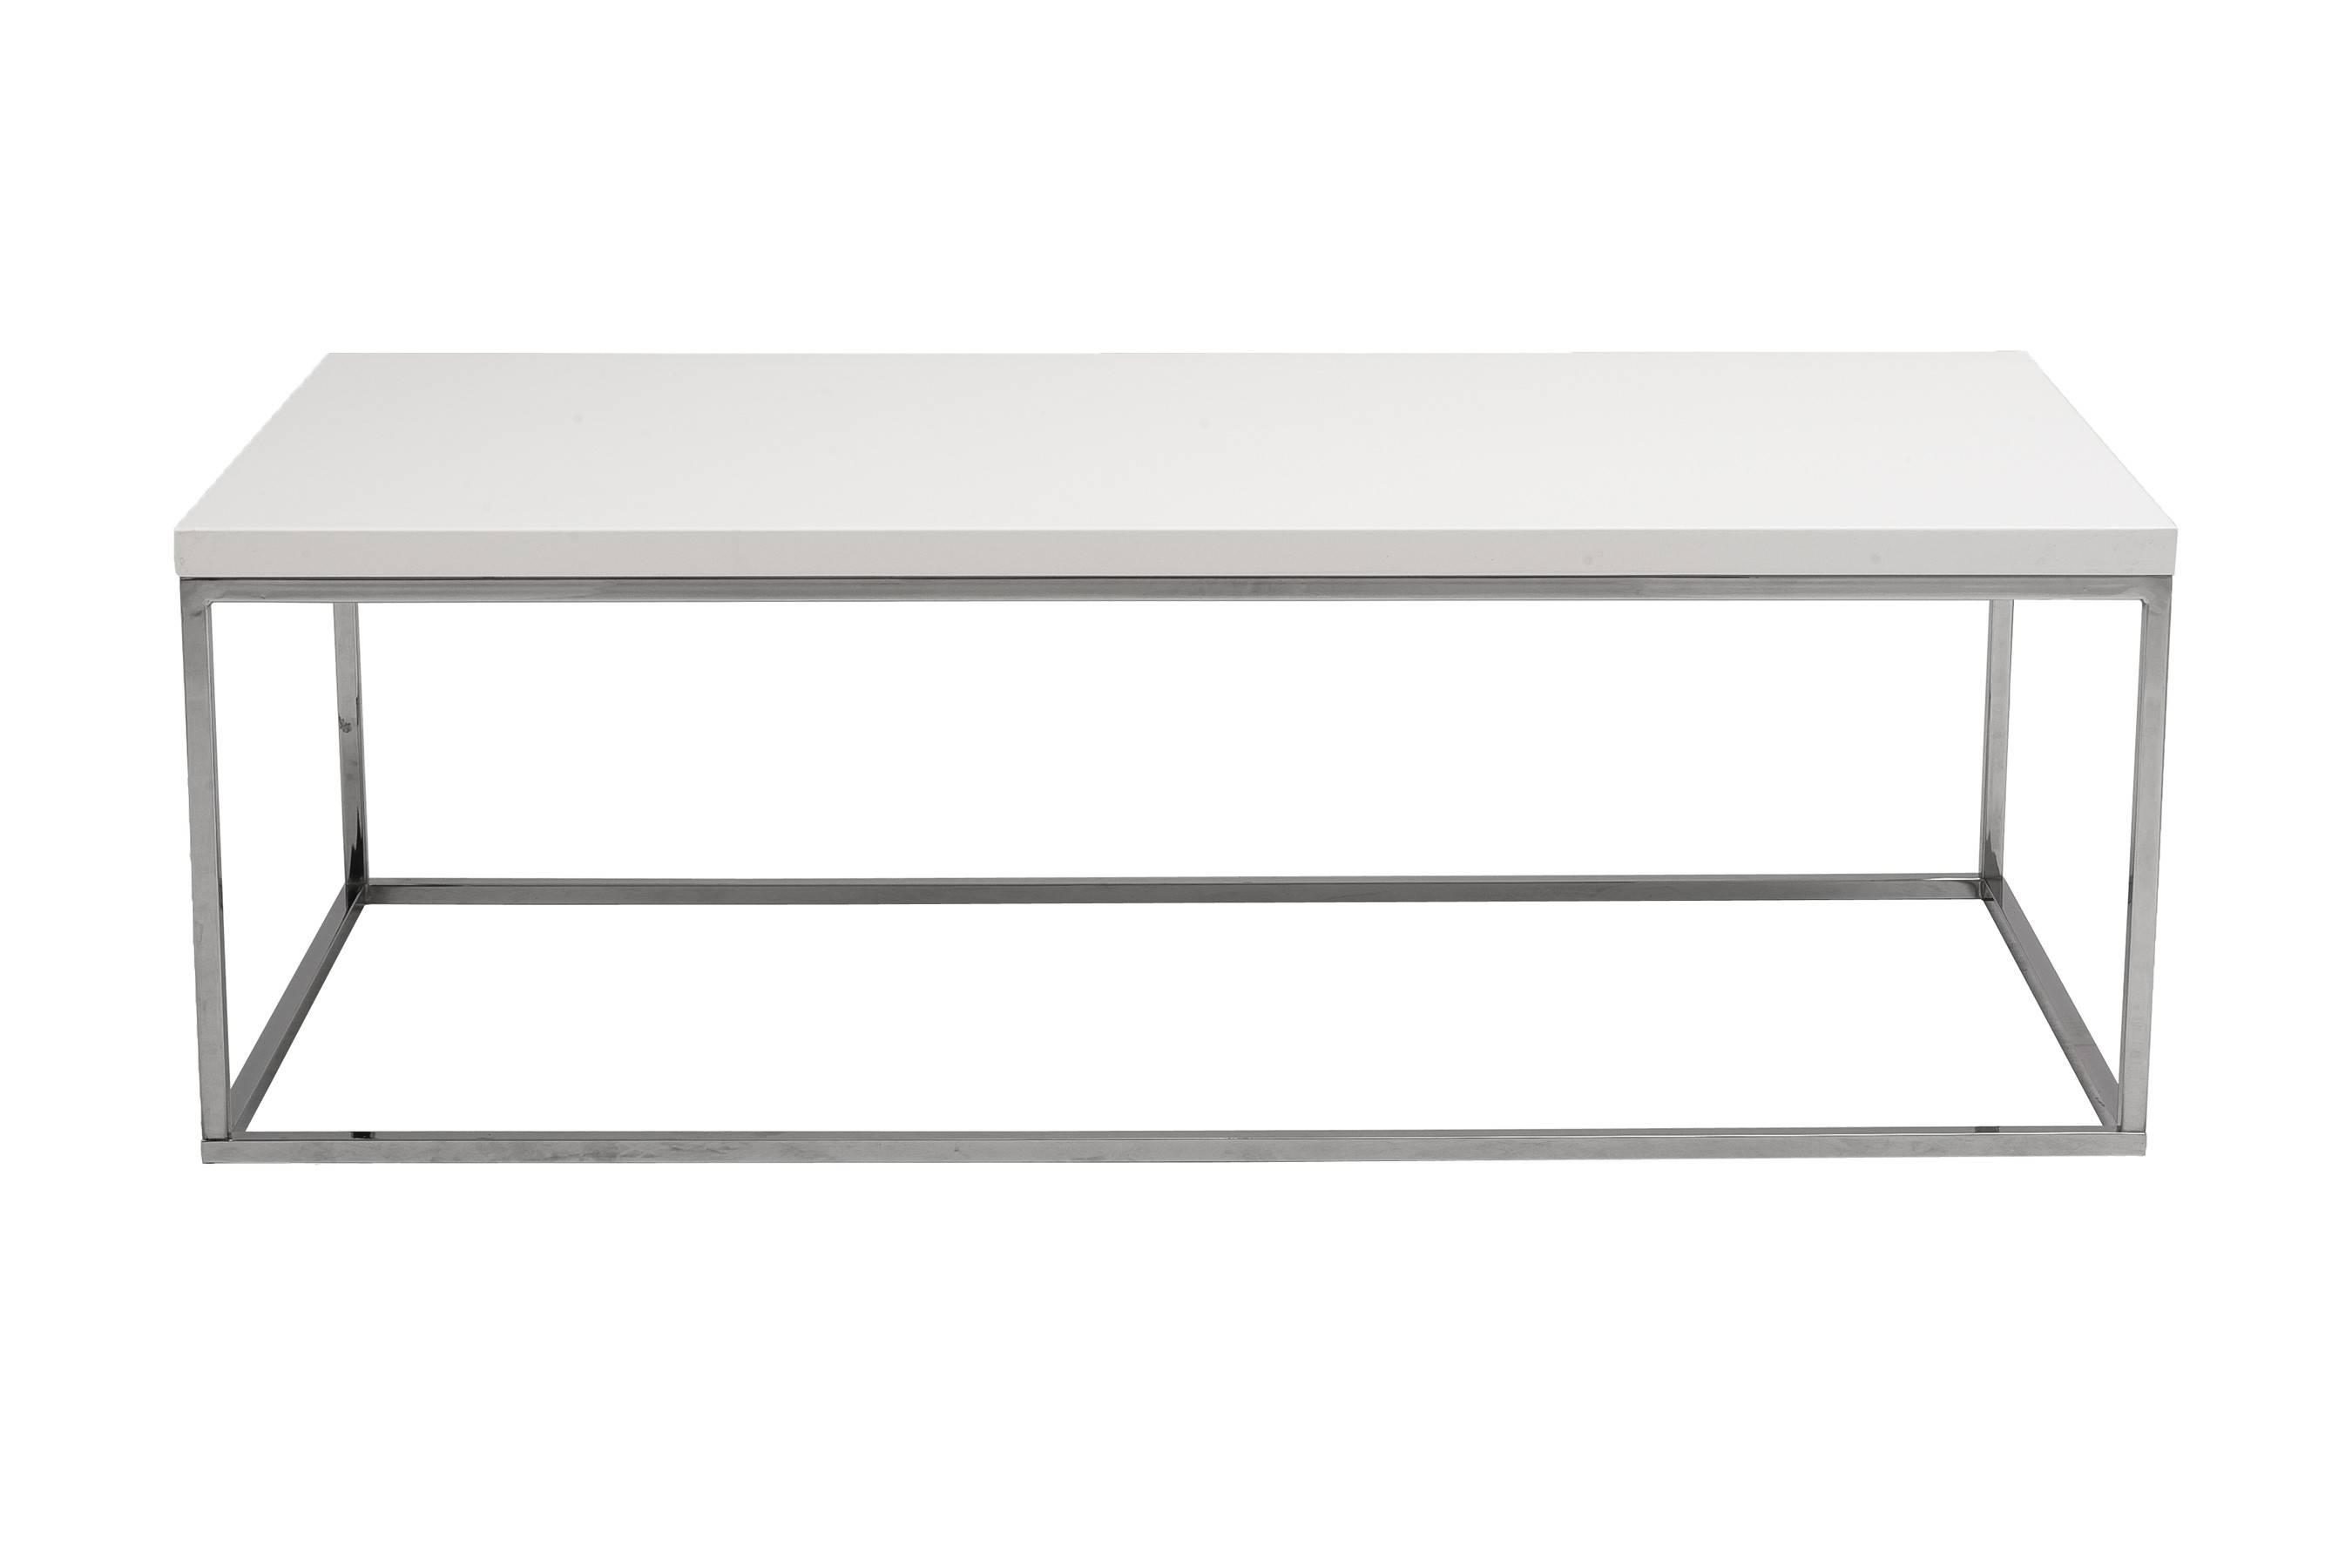 Rectangular Coffee Table | Coffee Table Design within Rectangular Coffee Tables (Image 14 of 15)